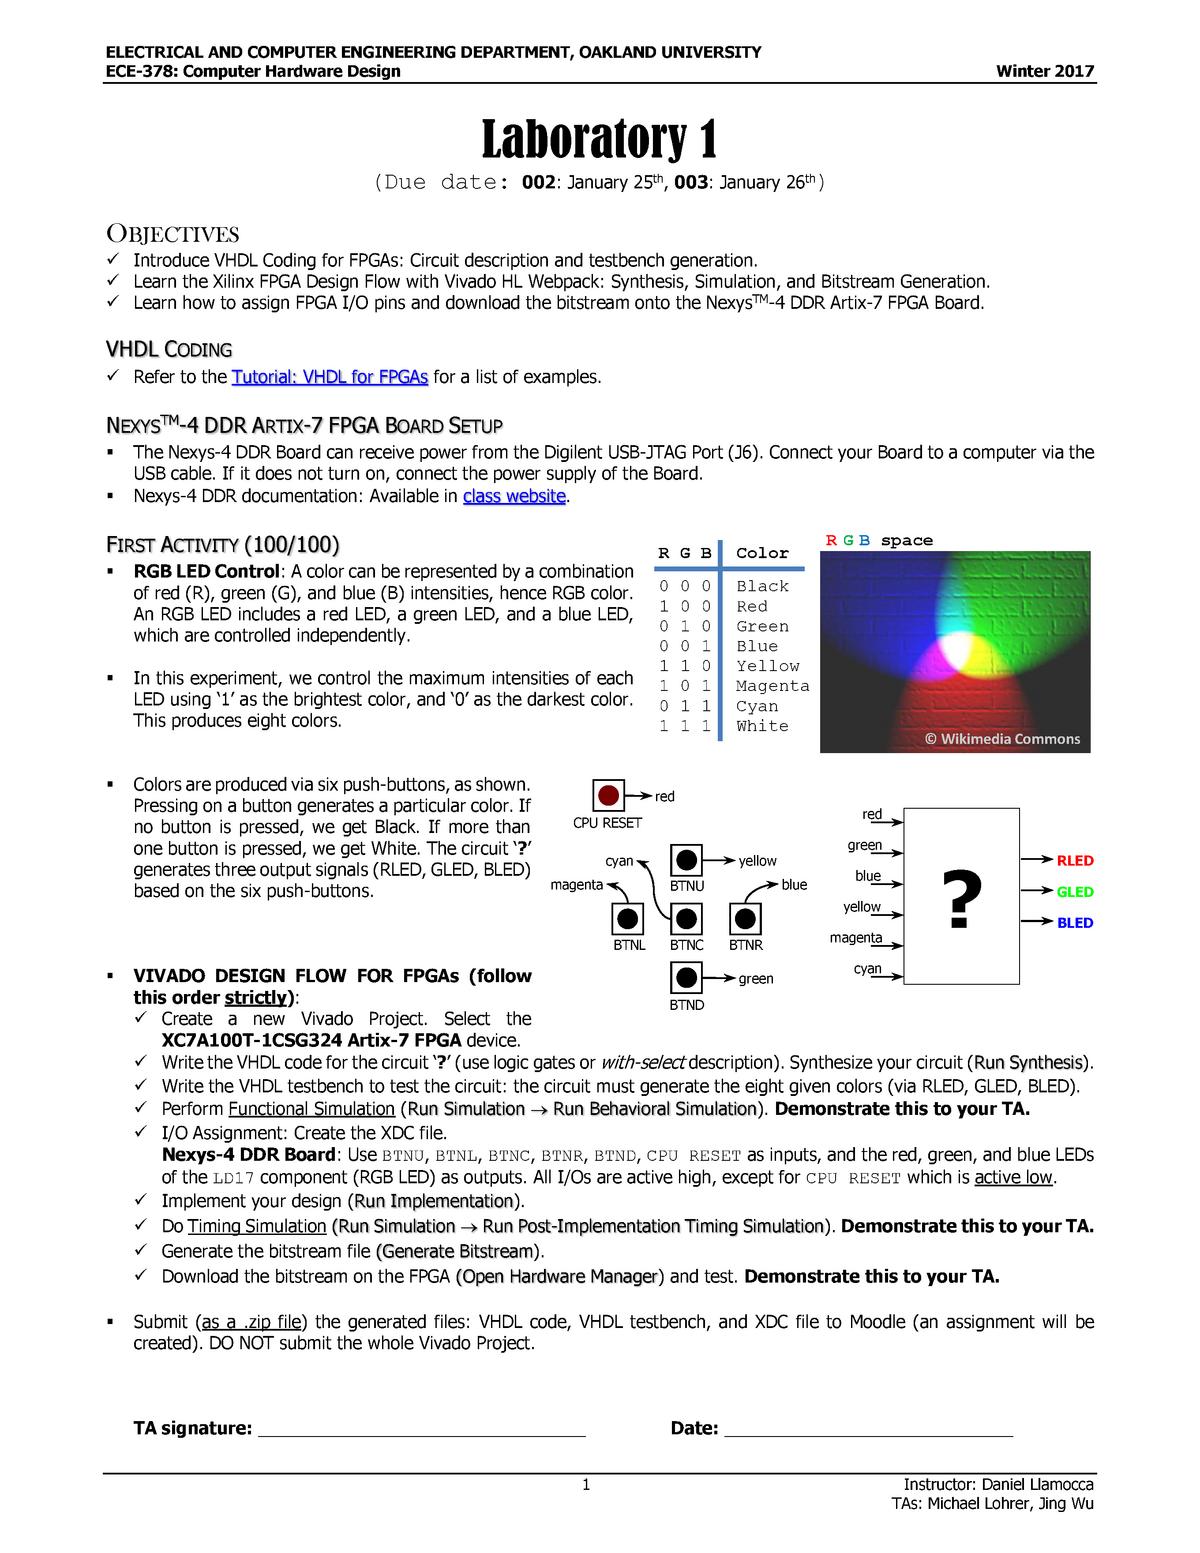 Lab 1 - Laboratory assignment 1 - ECE 378: Computer Hardware Design